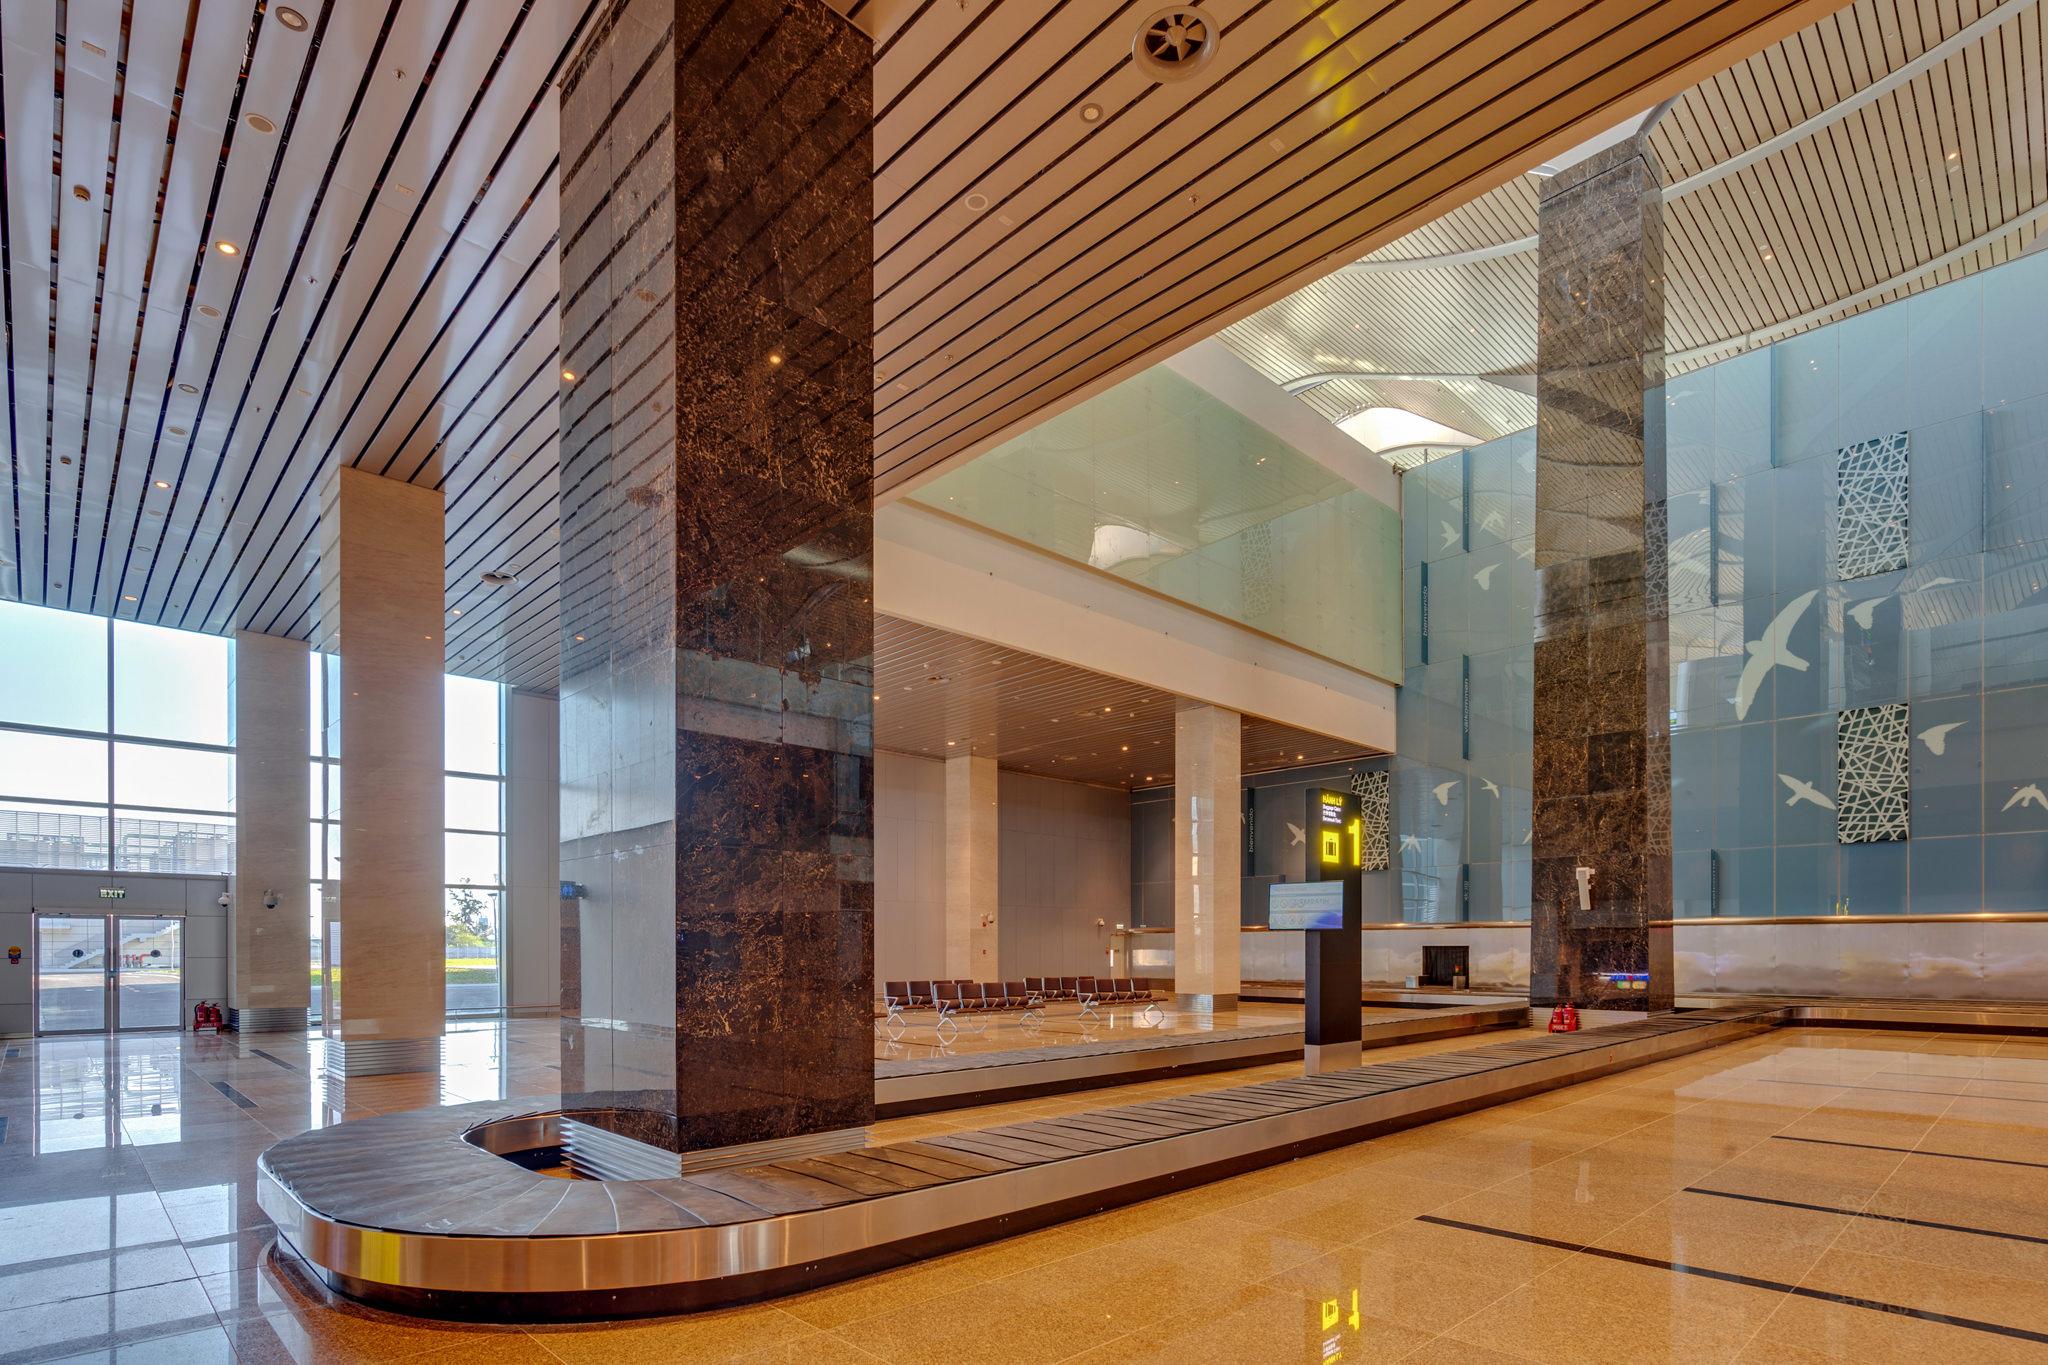 20180626 - Cam Ranh Airport - Architecture - 0123.jpg